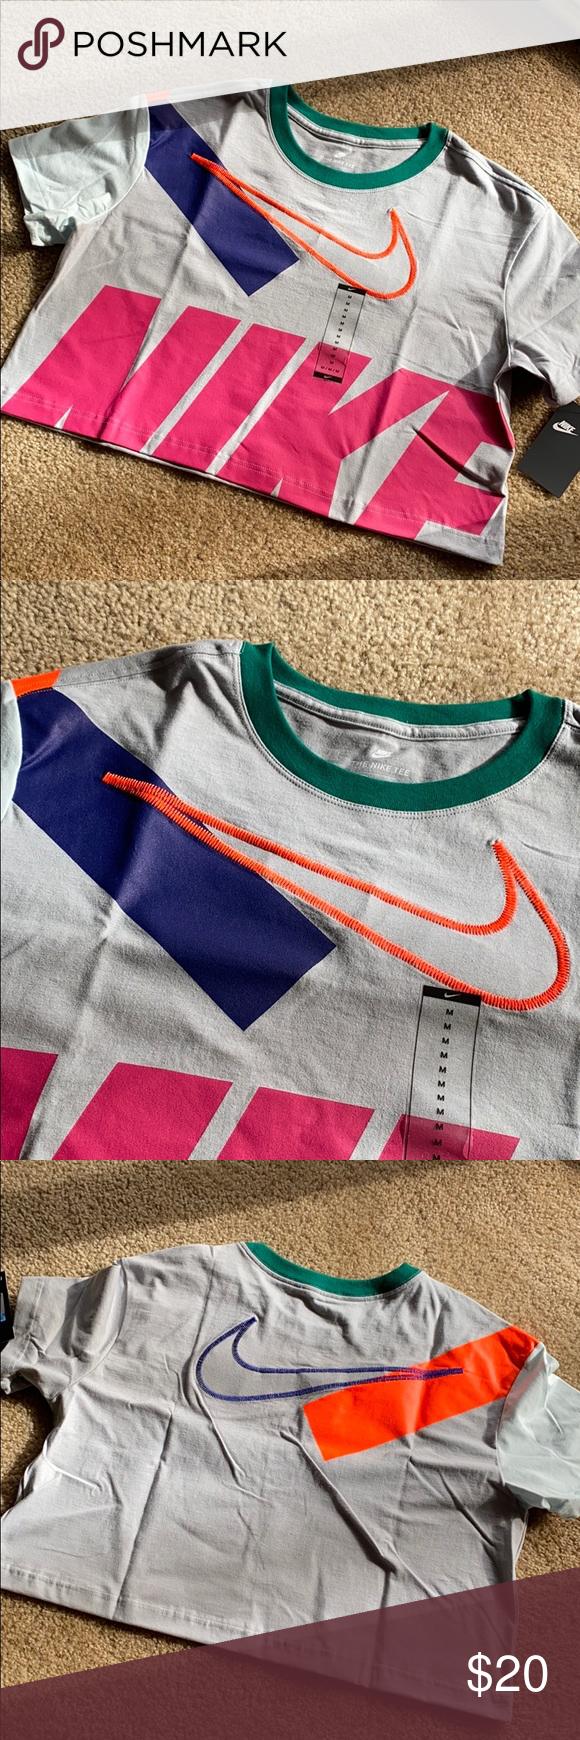 Nike Color Block Short Crop Top Crop Top And Shorts Crop Tops Short Tops [ 1740 x 580 Pixel ]